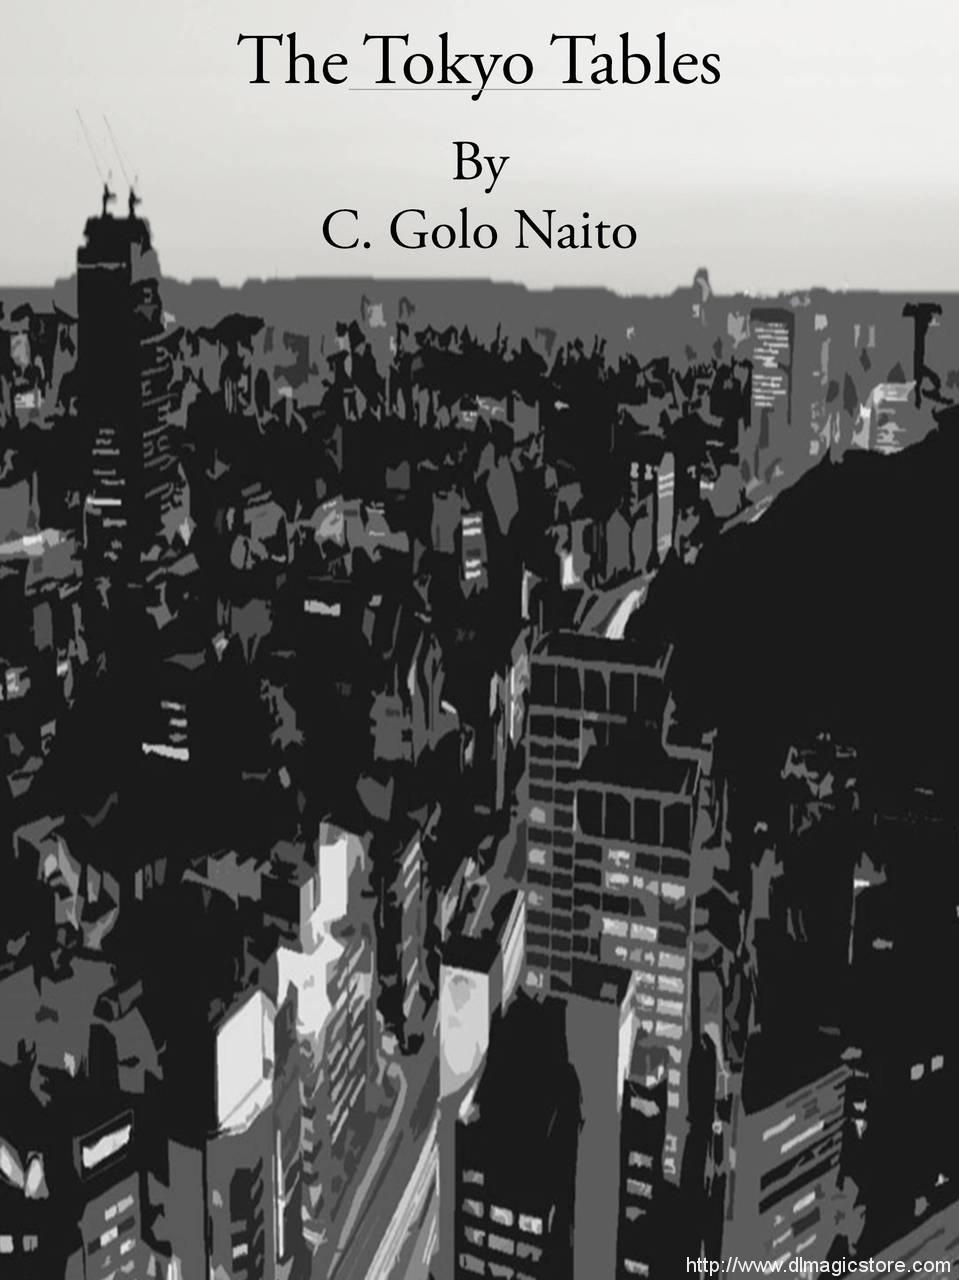 The Tokyo Tables by C.Golo Naito